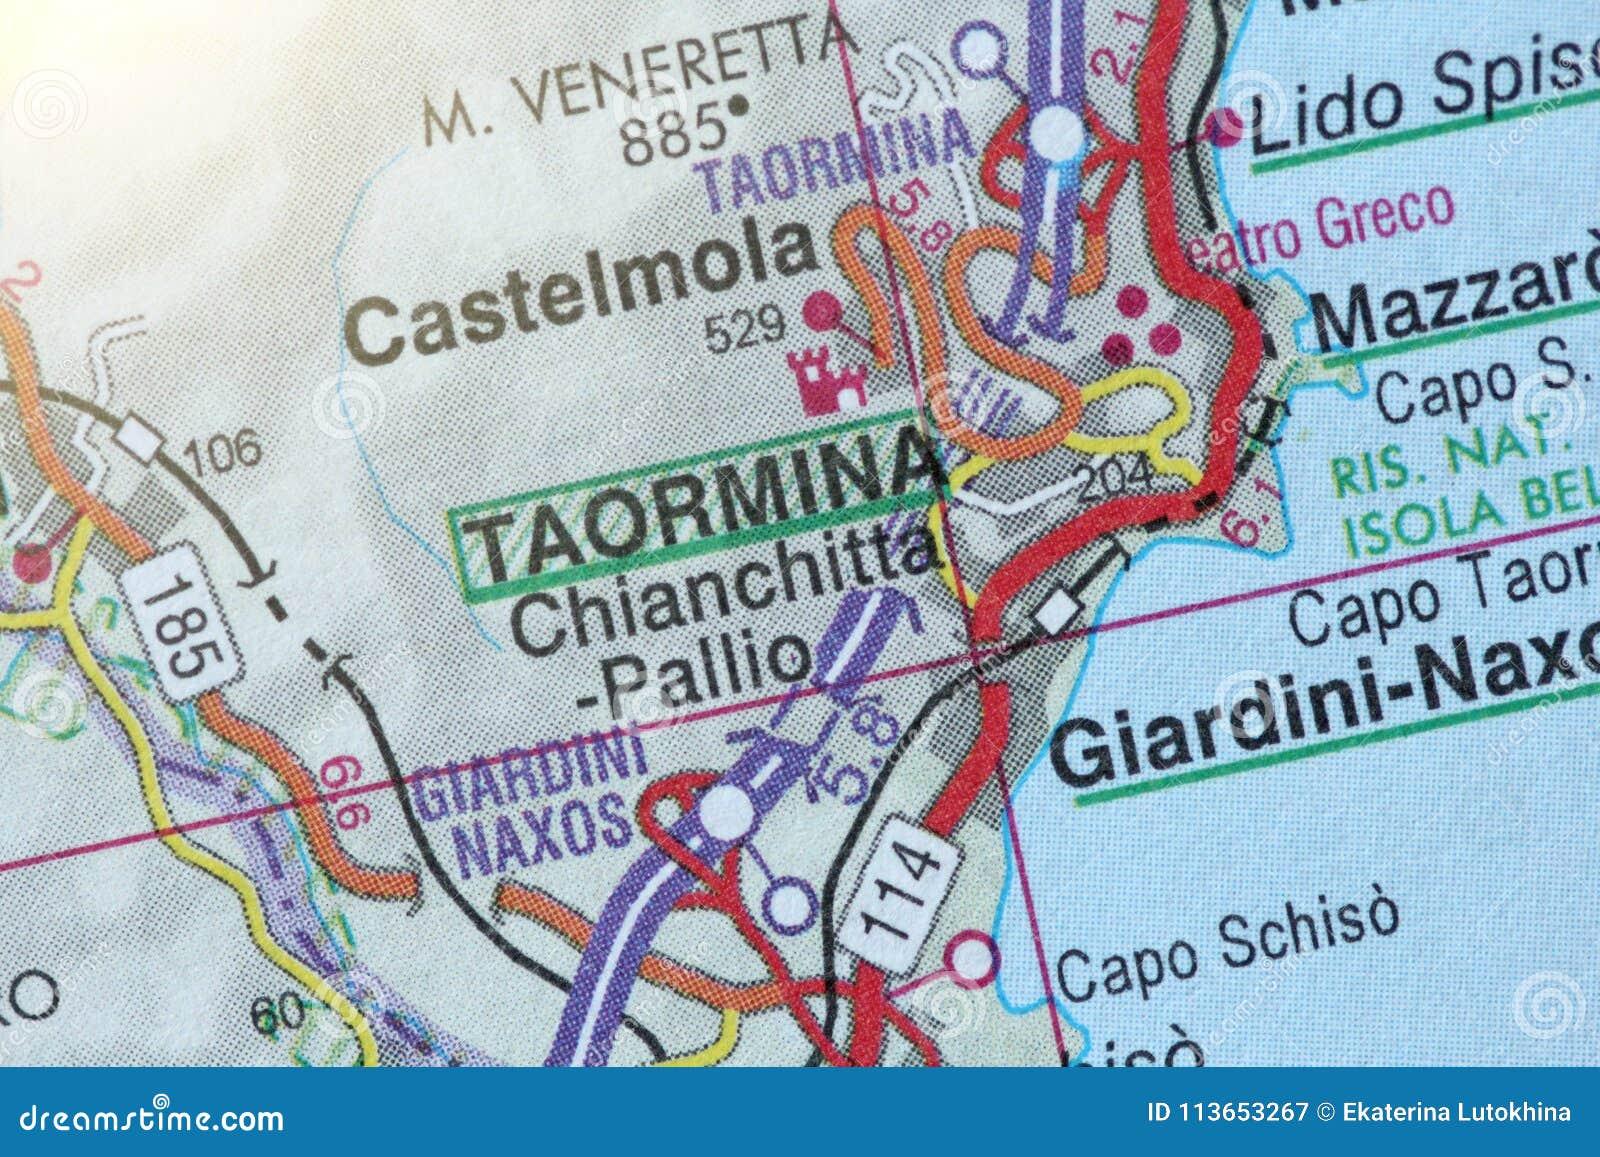 Taormina The Island Of Sicily Italy Stock Image Image Of